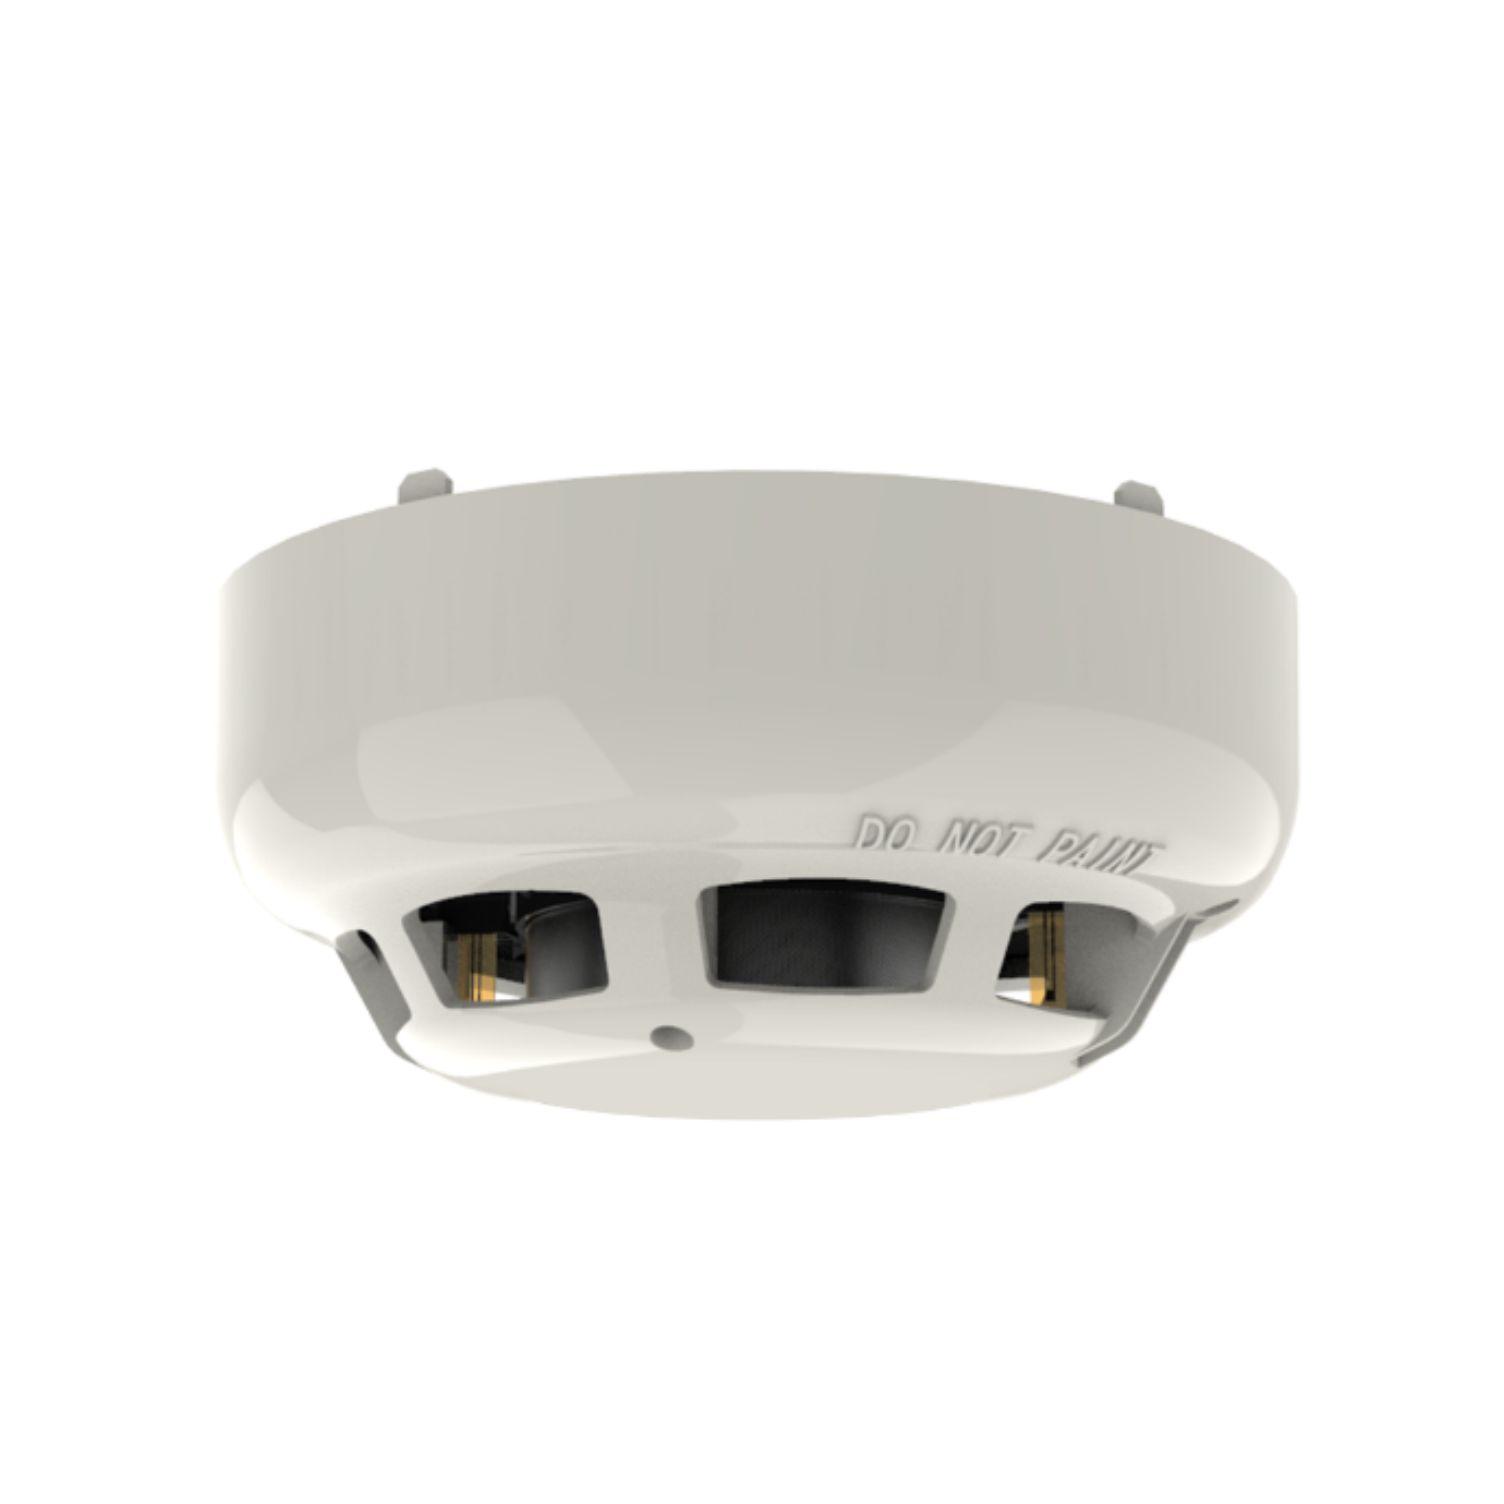 Multi-Sensor Photoelectric/Heat - Ivory case